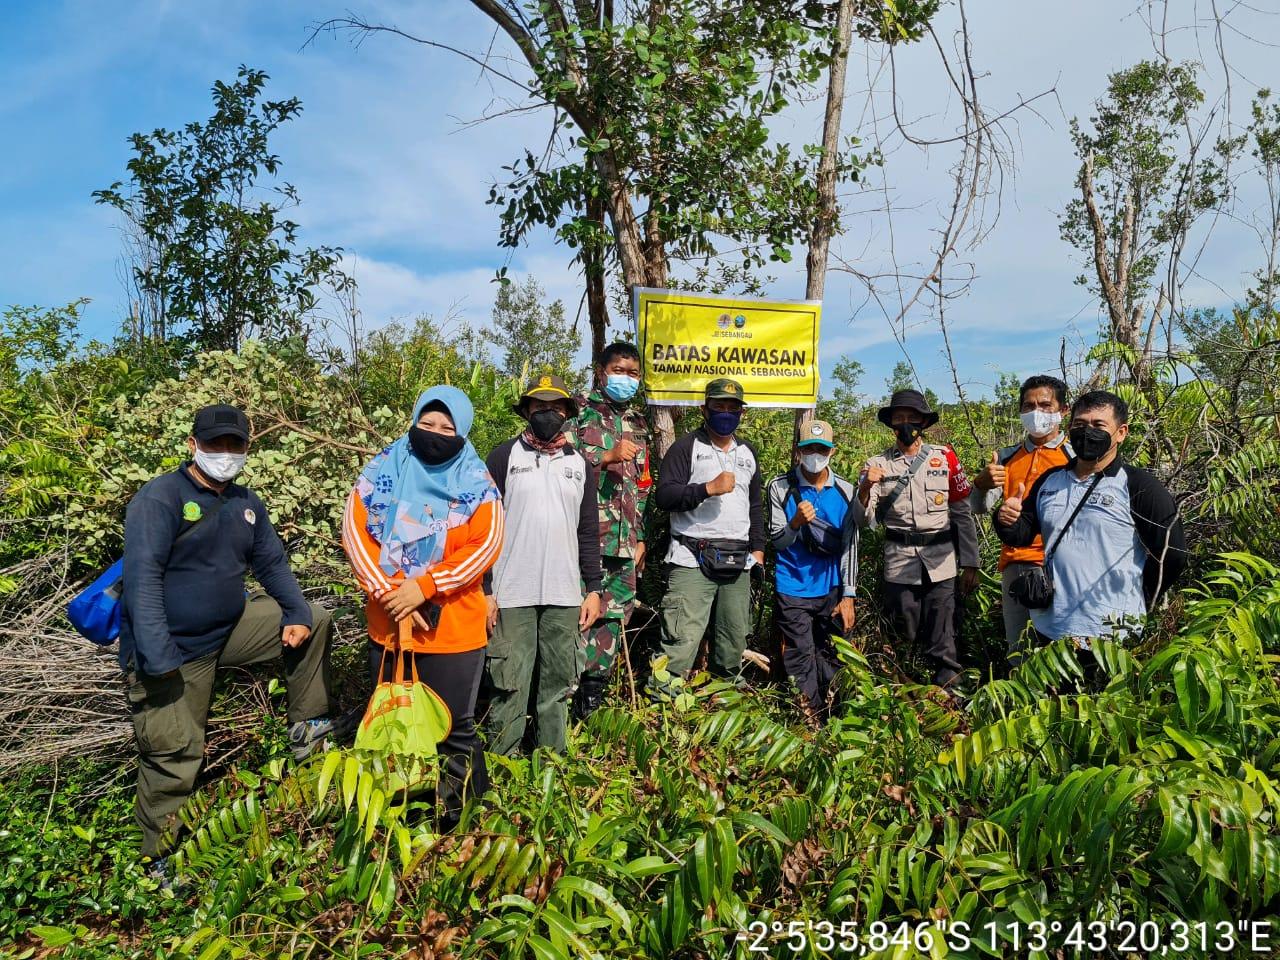 Bhabinkamtibmas Aipda Azis Ajak Masyarakat Menjaga Kawasan Taman Nasional